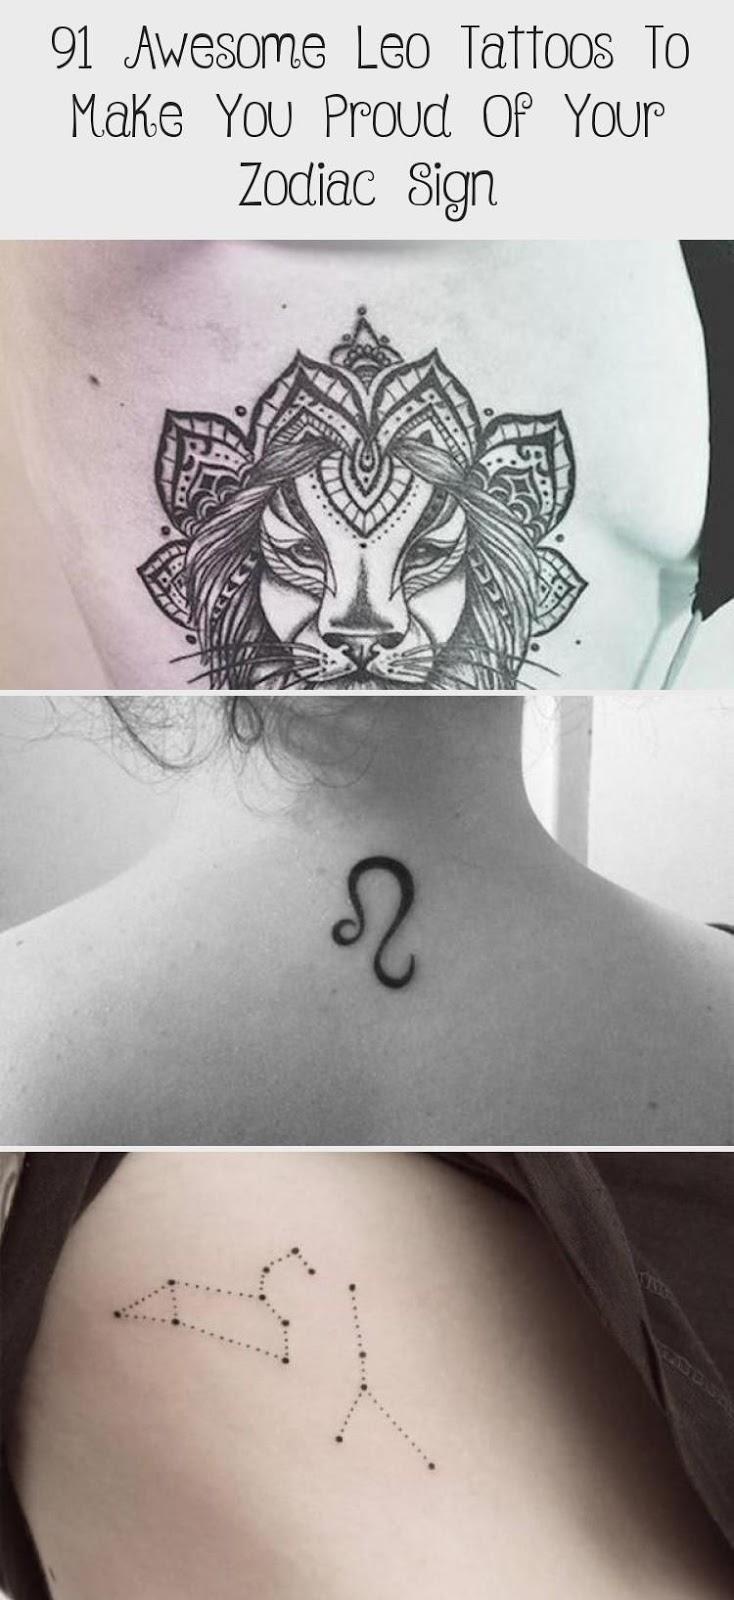 Leo Zodiac Horoscope Sign Symbol Tattoo Designs (193)